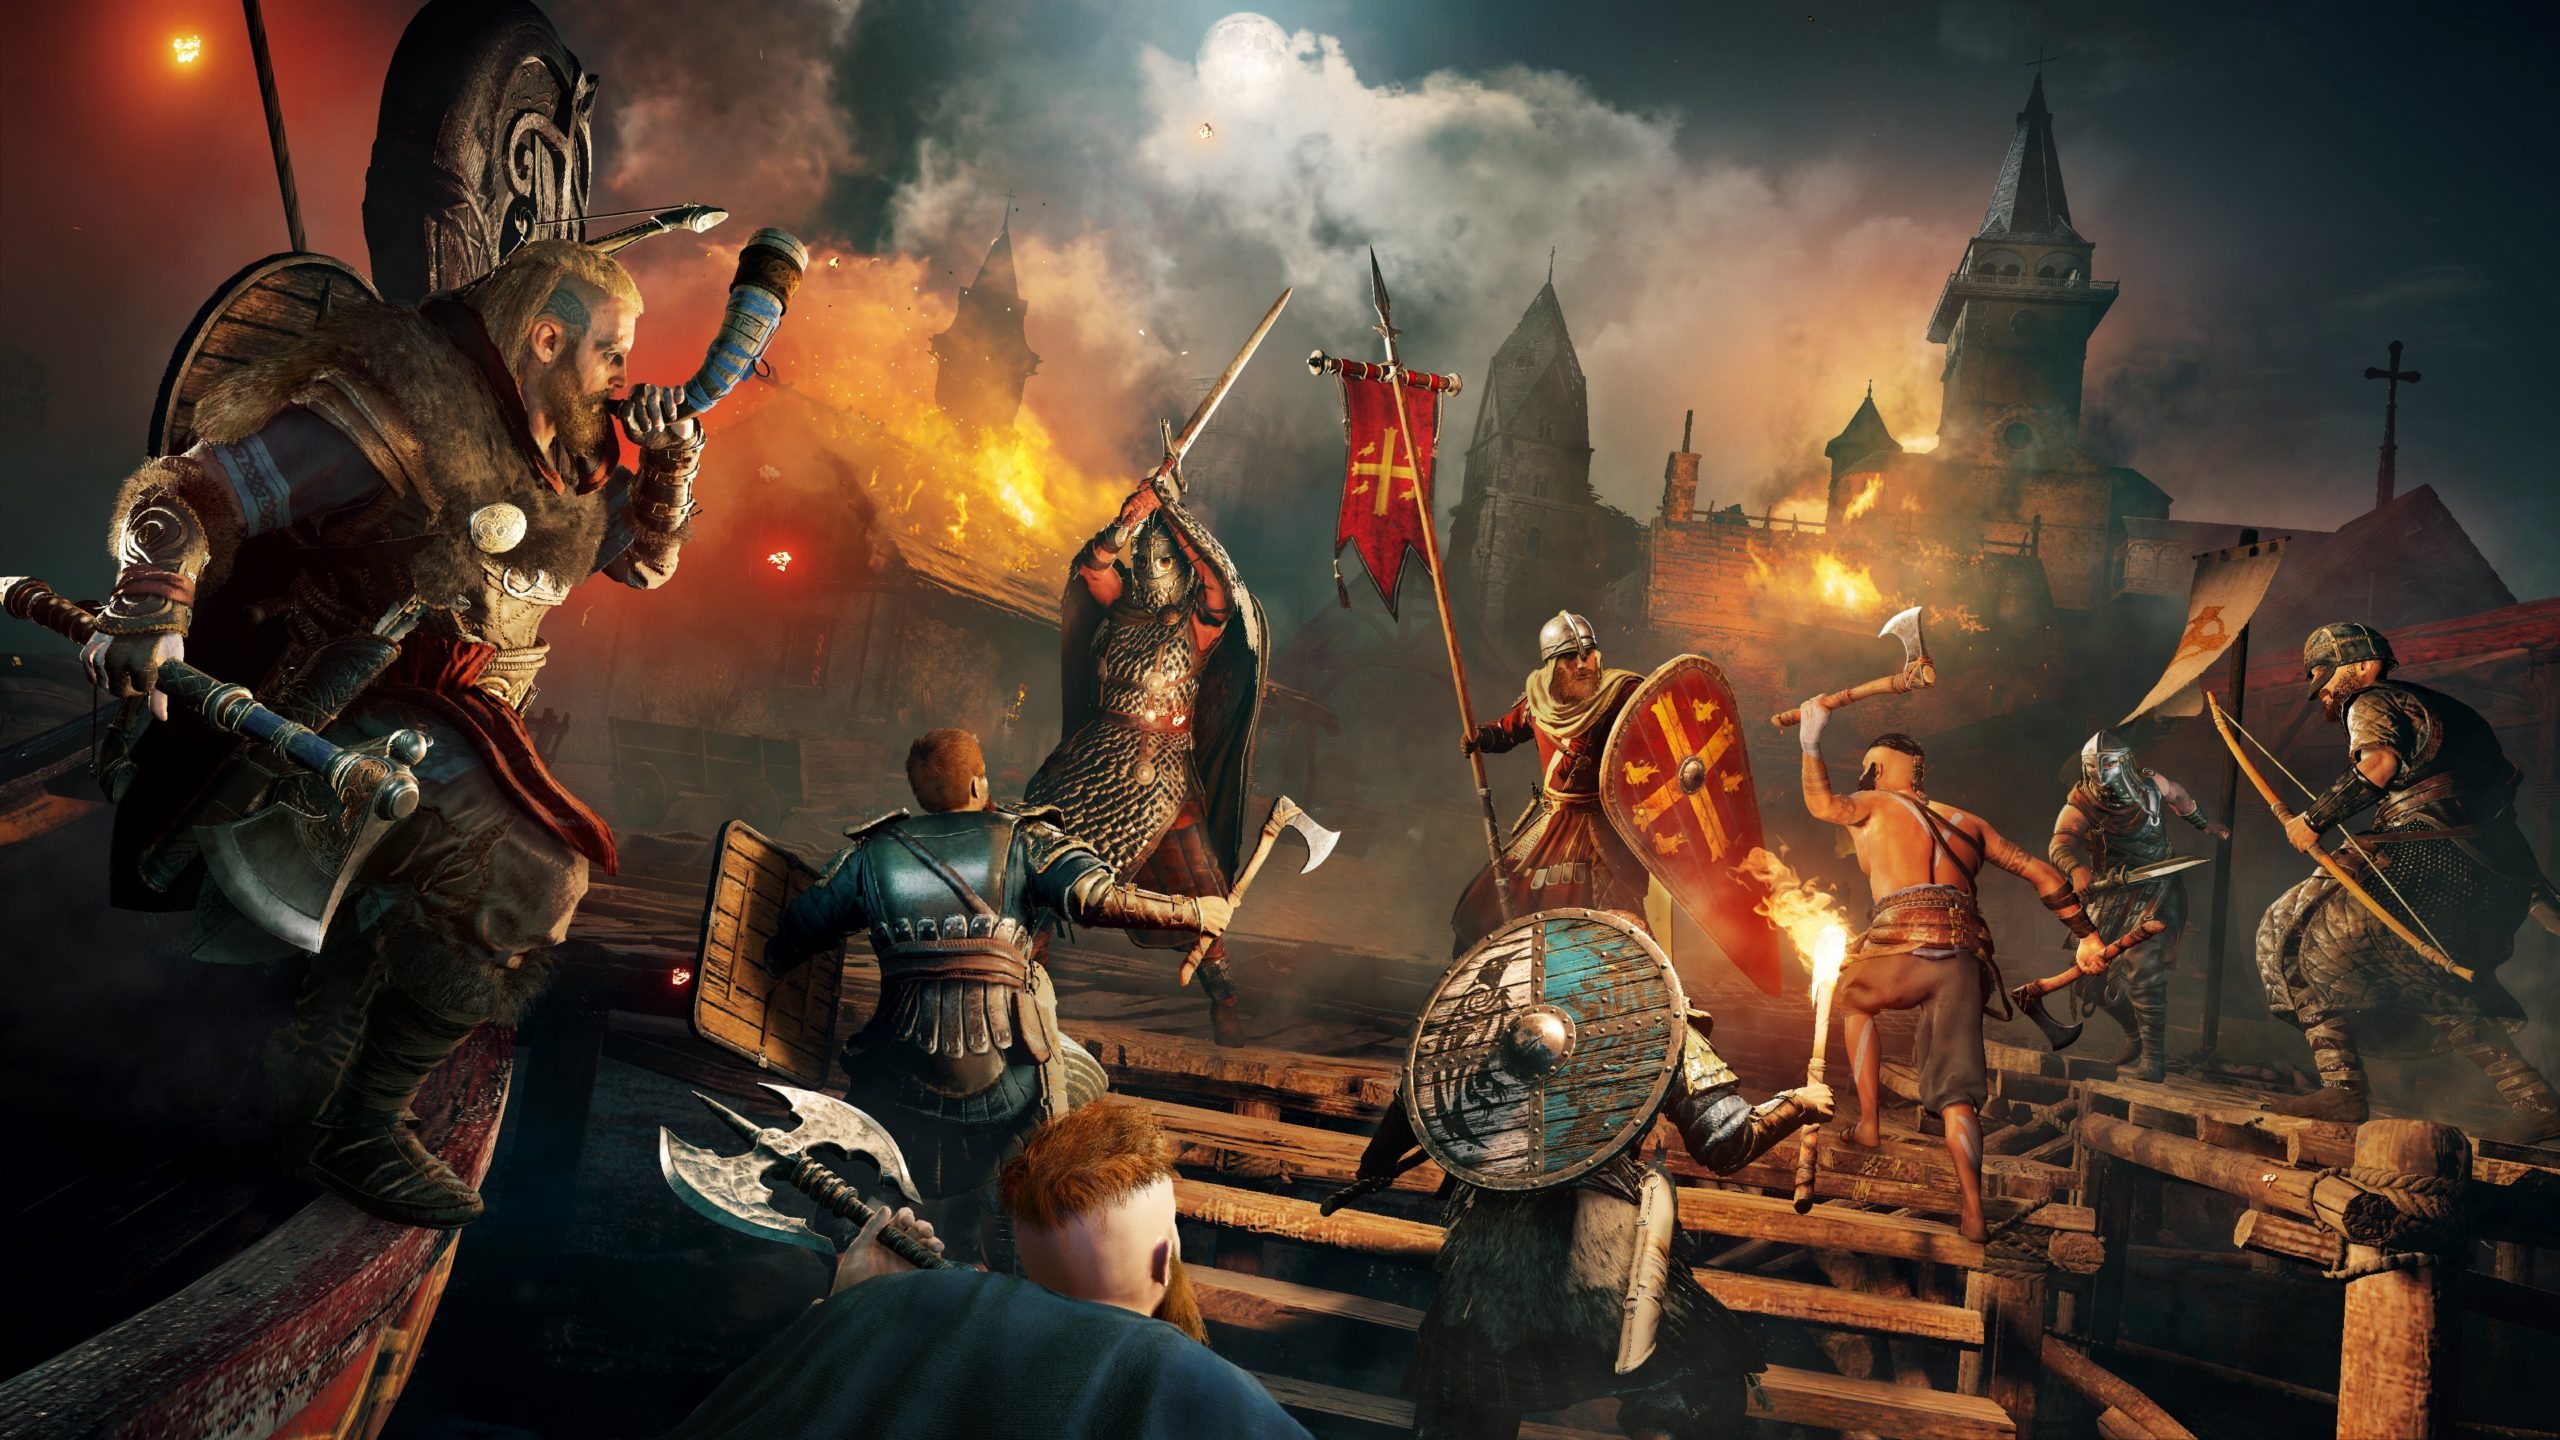 Assassin's Creed Valhalla pillage